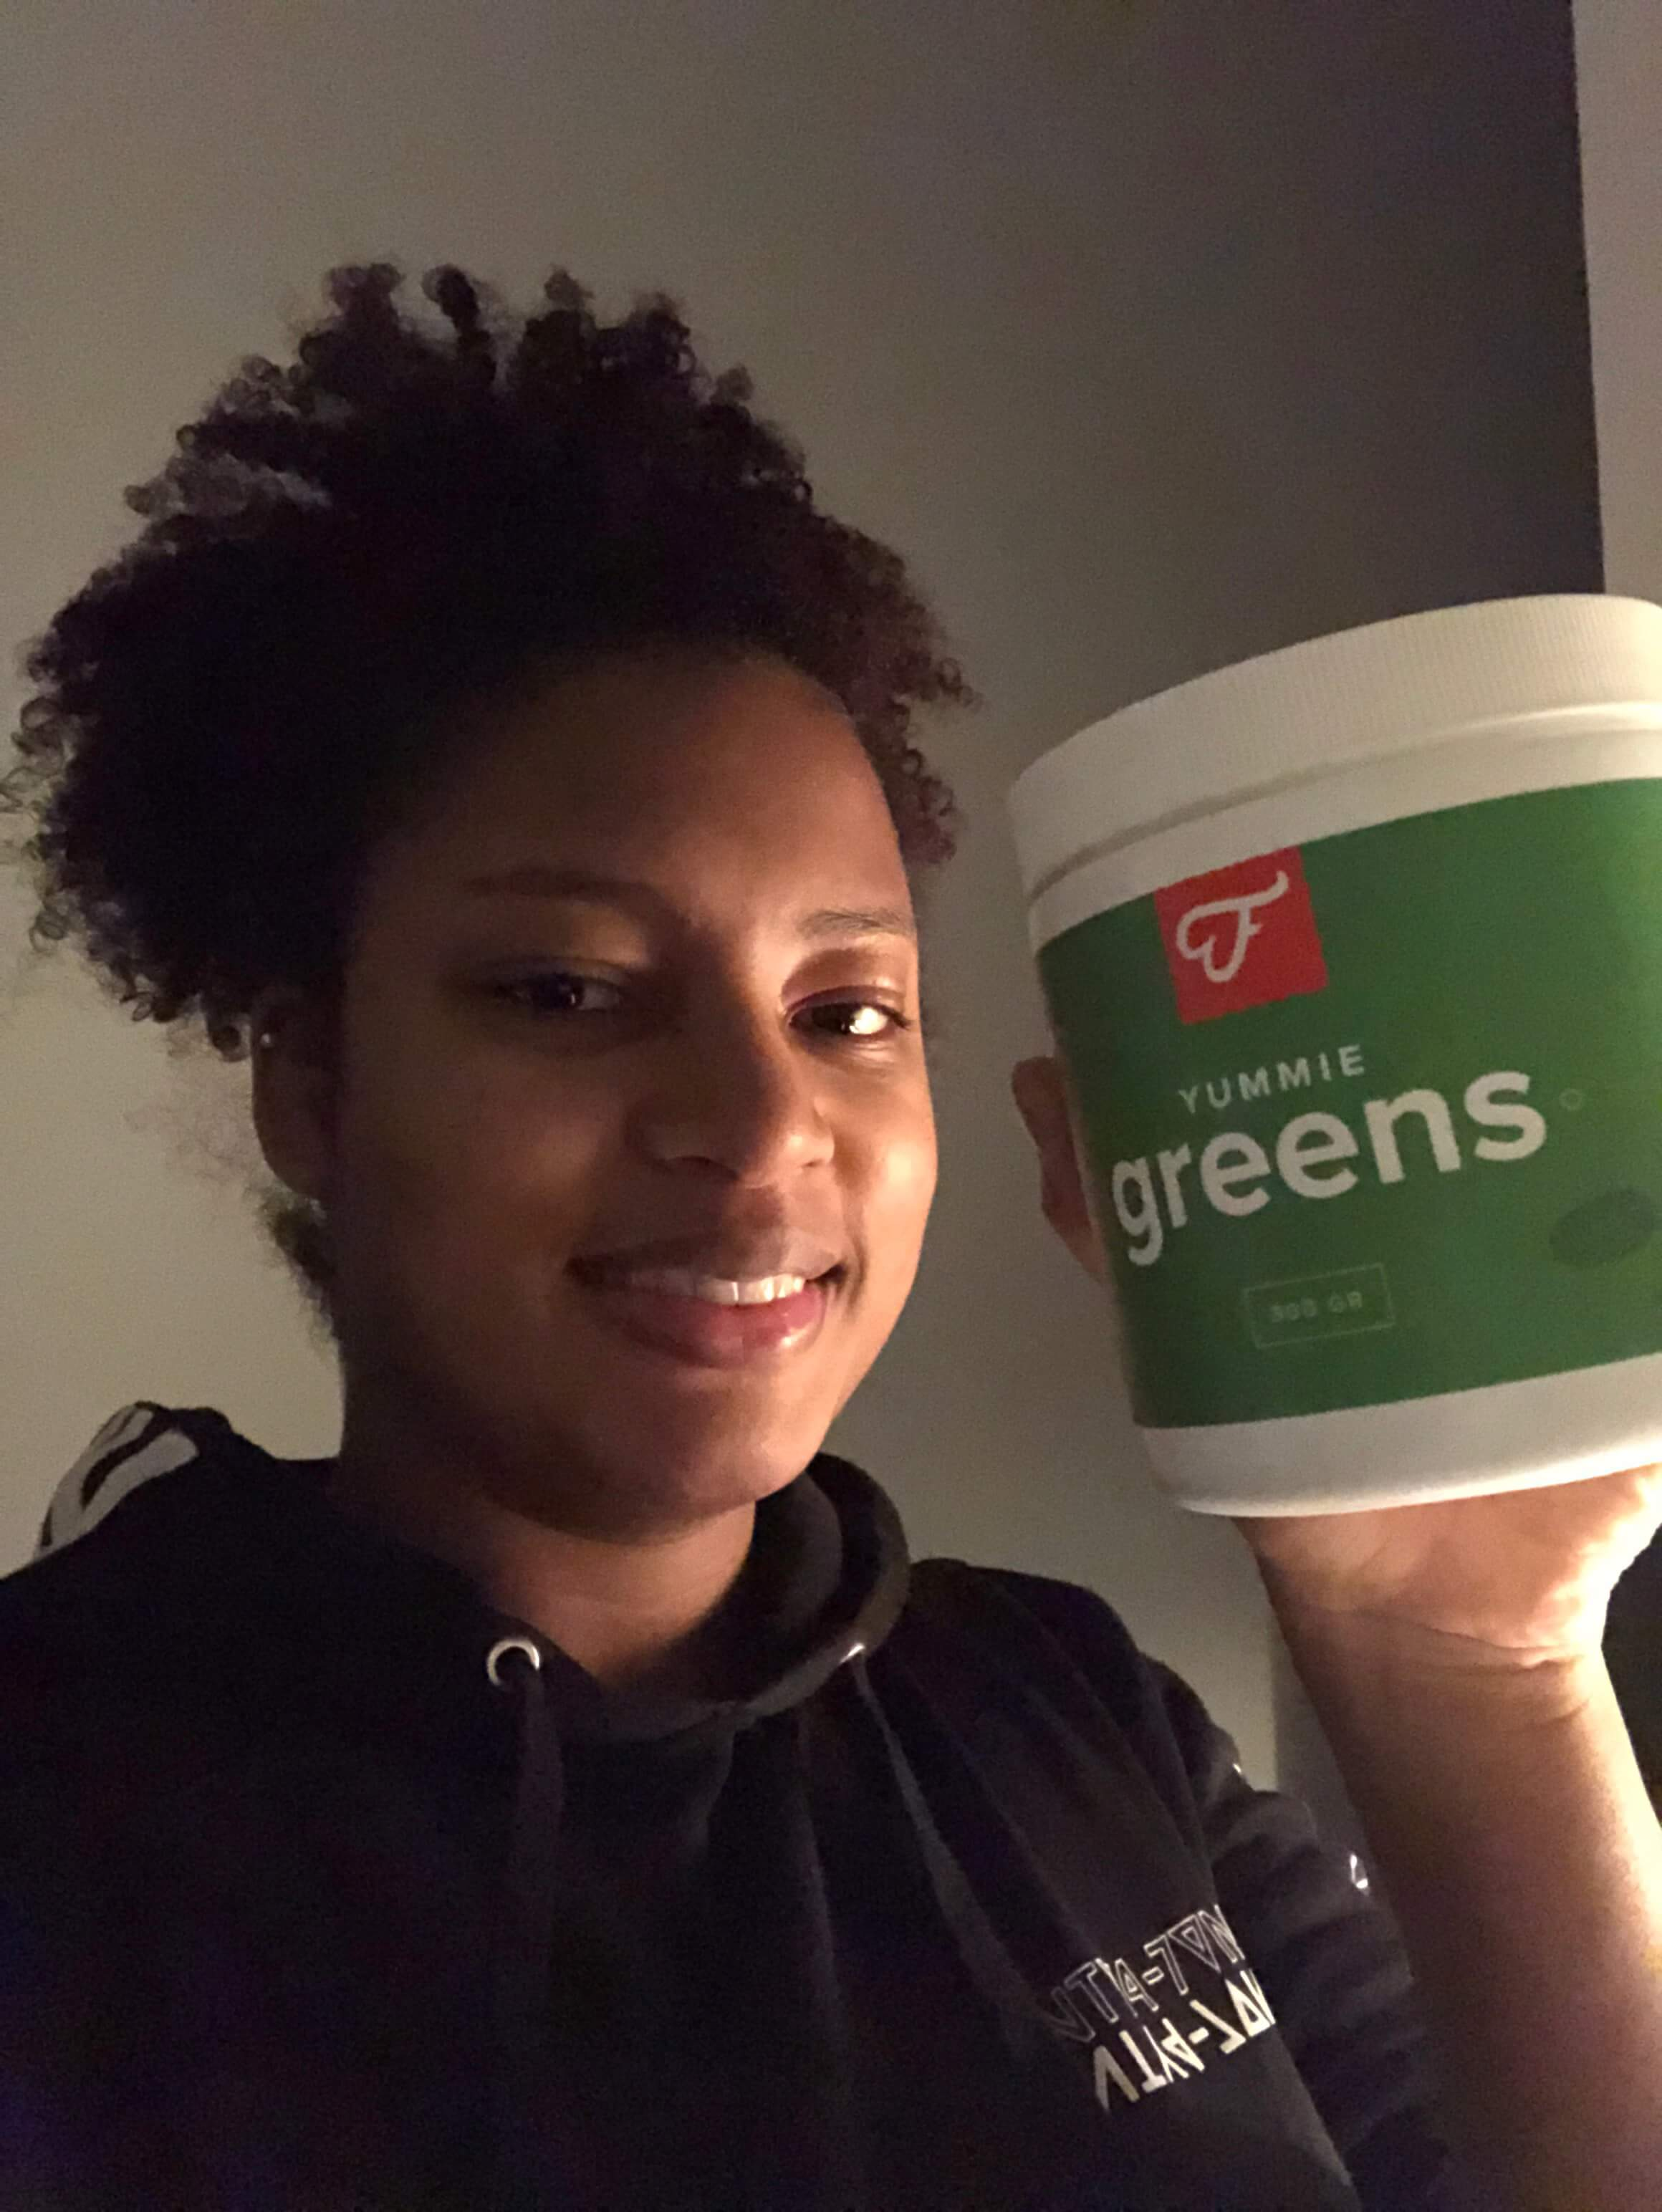 Jacyntha Greens